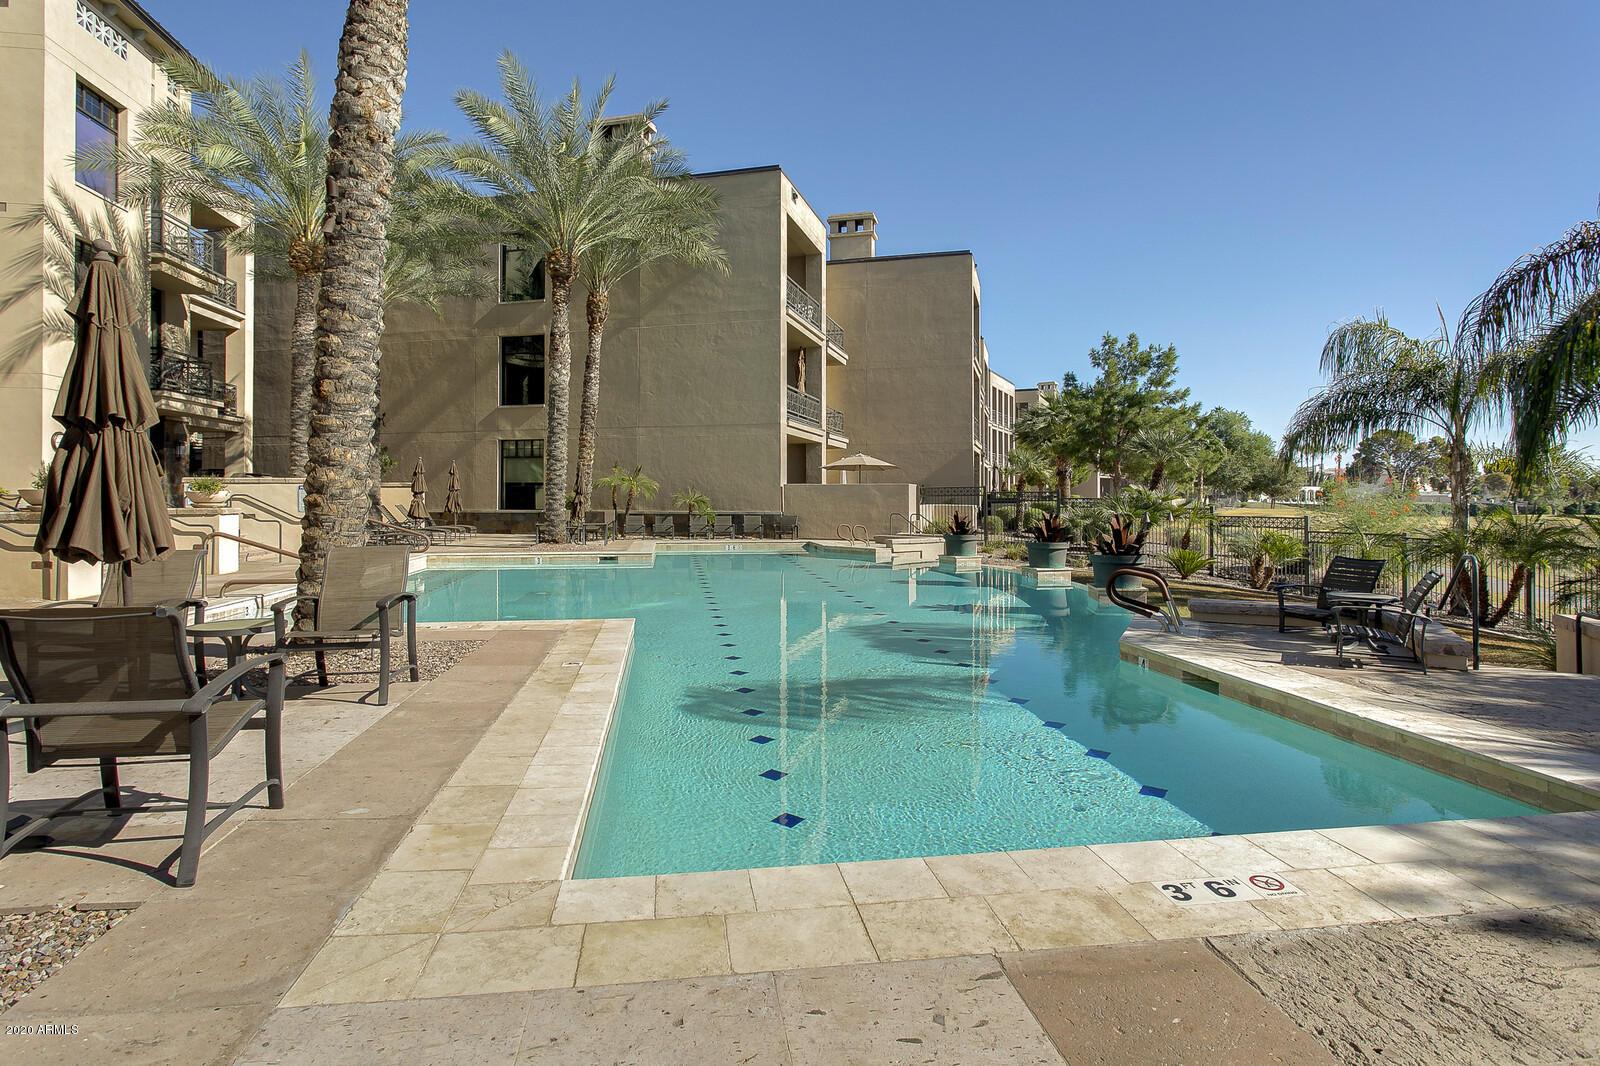 MLS 6154606 8 BILTMORE Estate Unit 320, Phoenix, AZ 85016 Phoenix AZ Two Bedroom